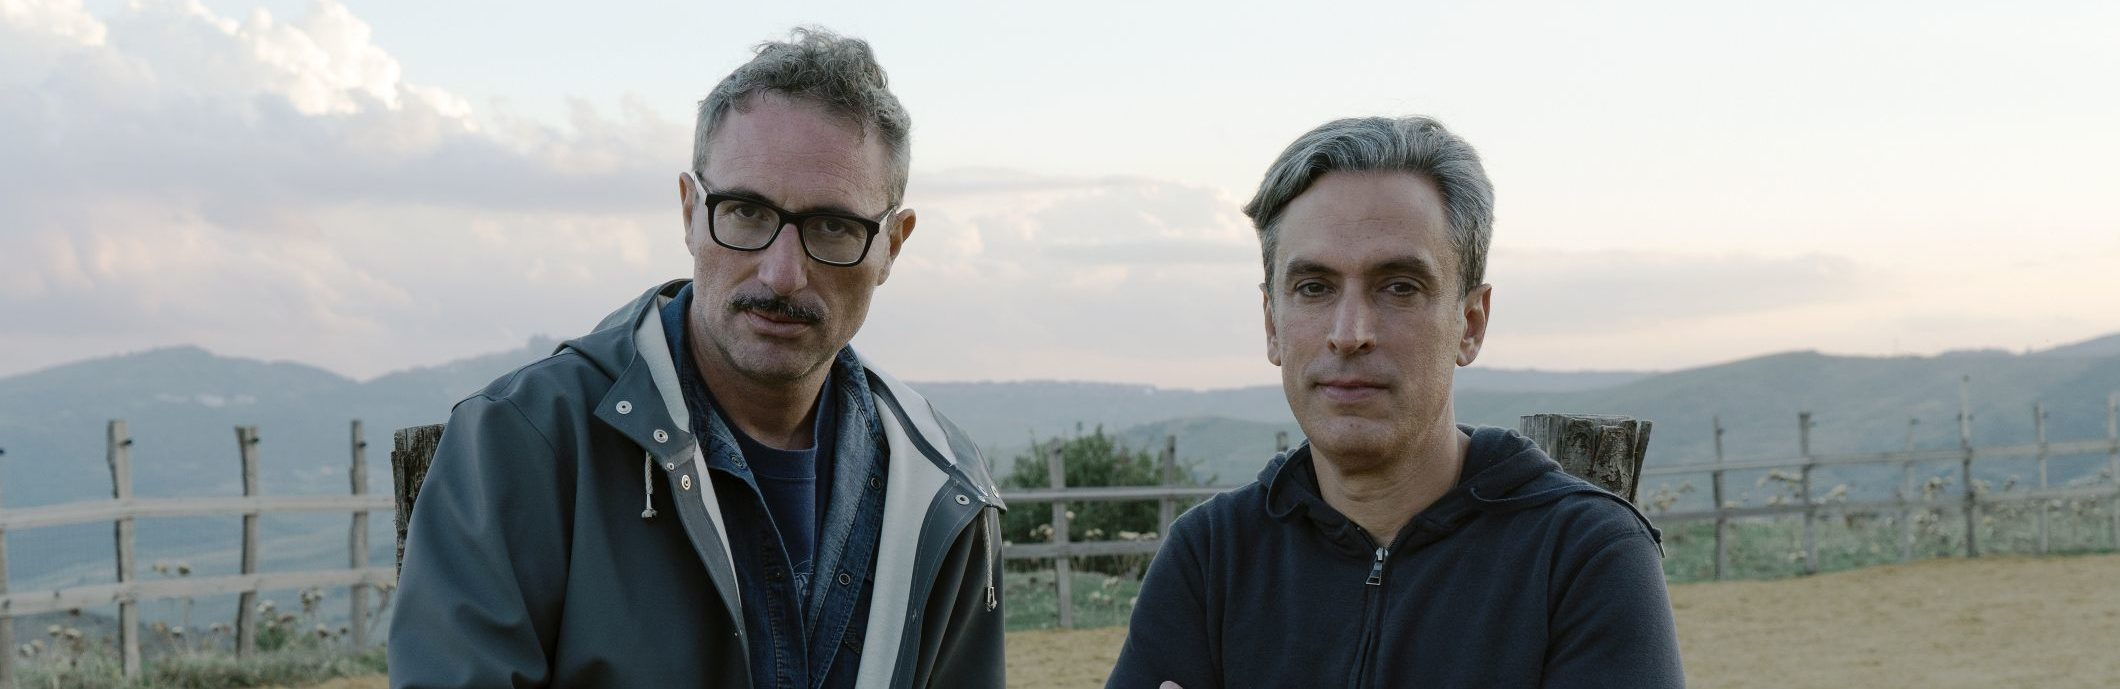 Cannes, <i>Sicilian Ghost Story</i> di Grassadonia e Piazza apre la <i>Semaine de la critique</i>